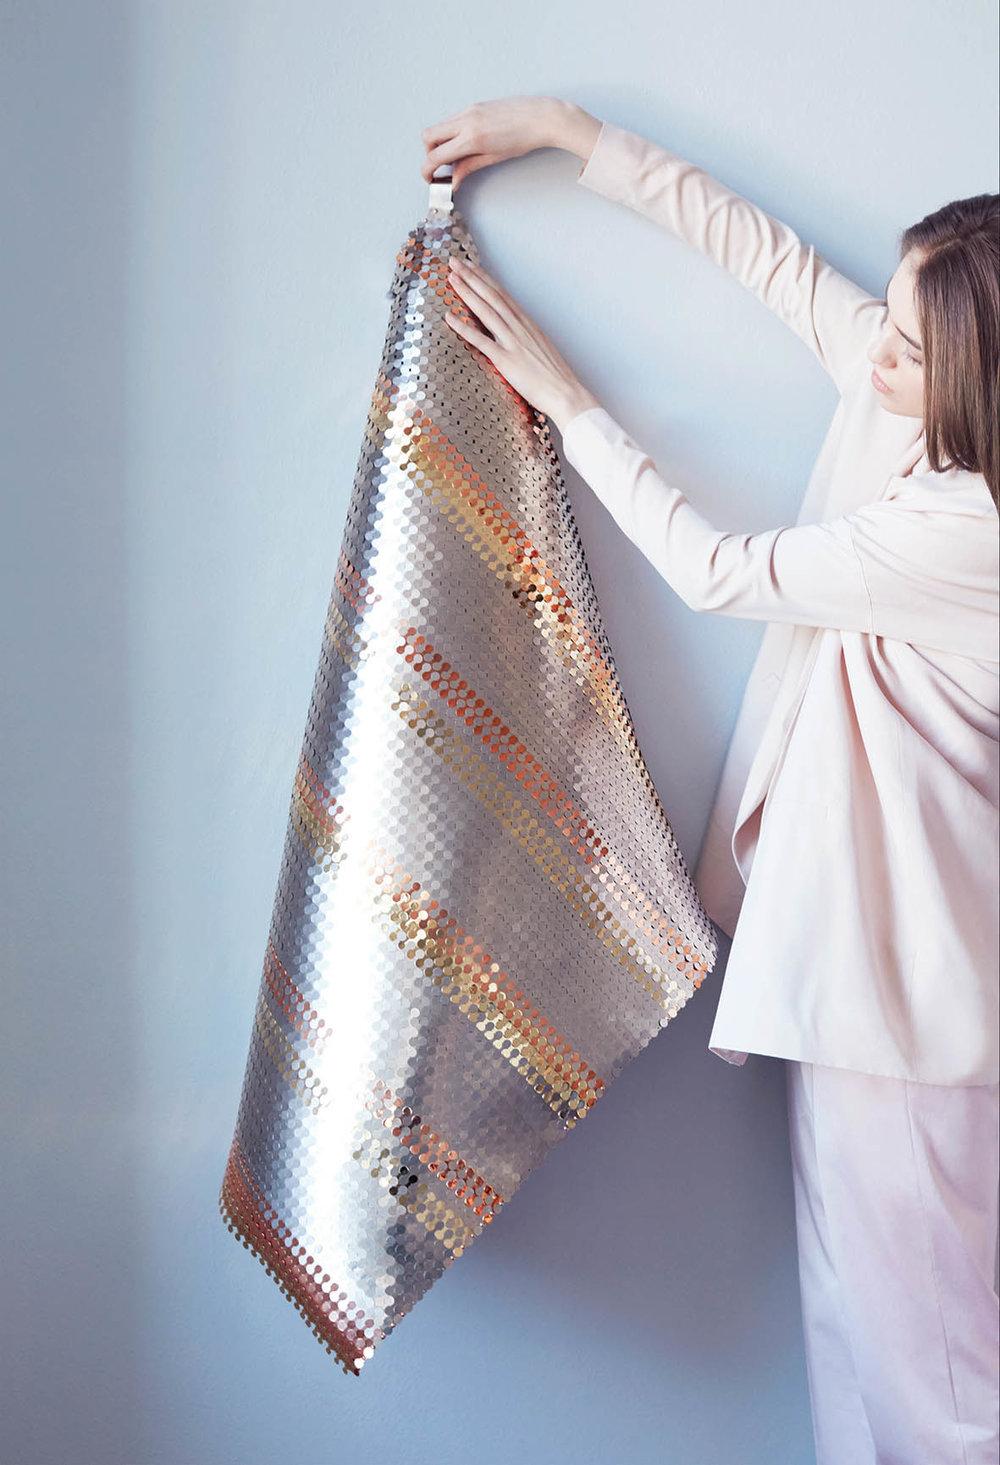 'Metal fabric' created by Malgorzata Mozolewska